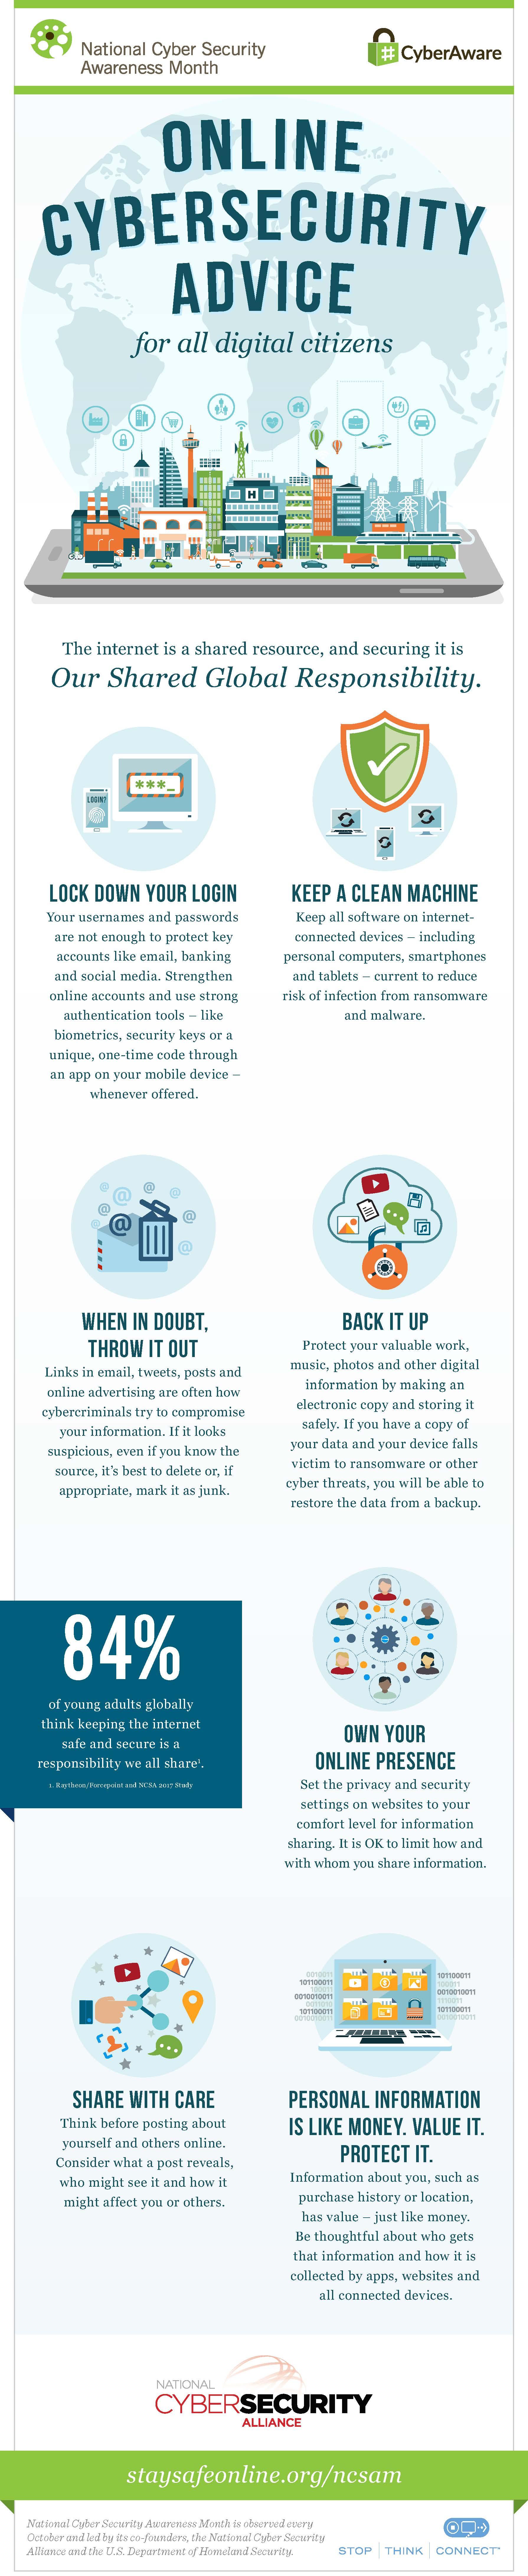 NCSAM-Online-Safety-Advice-For-All-Digital-Citizens.jpg